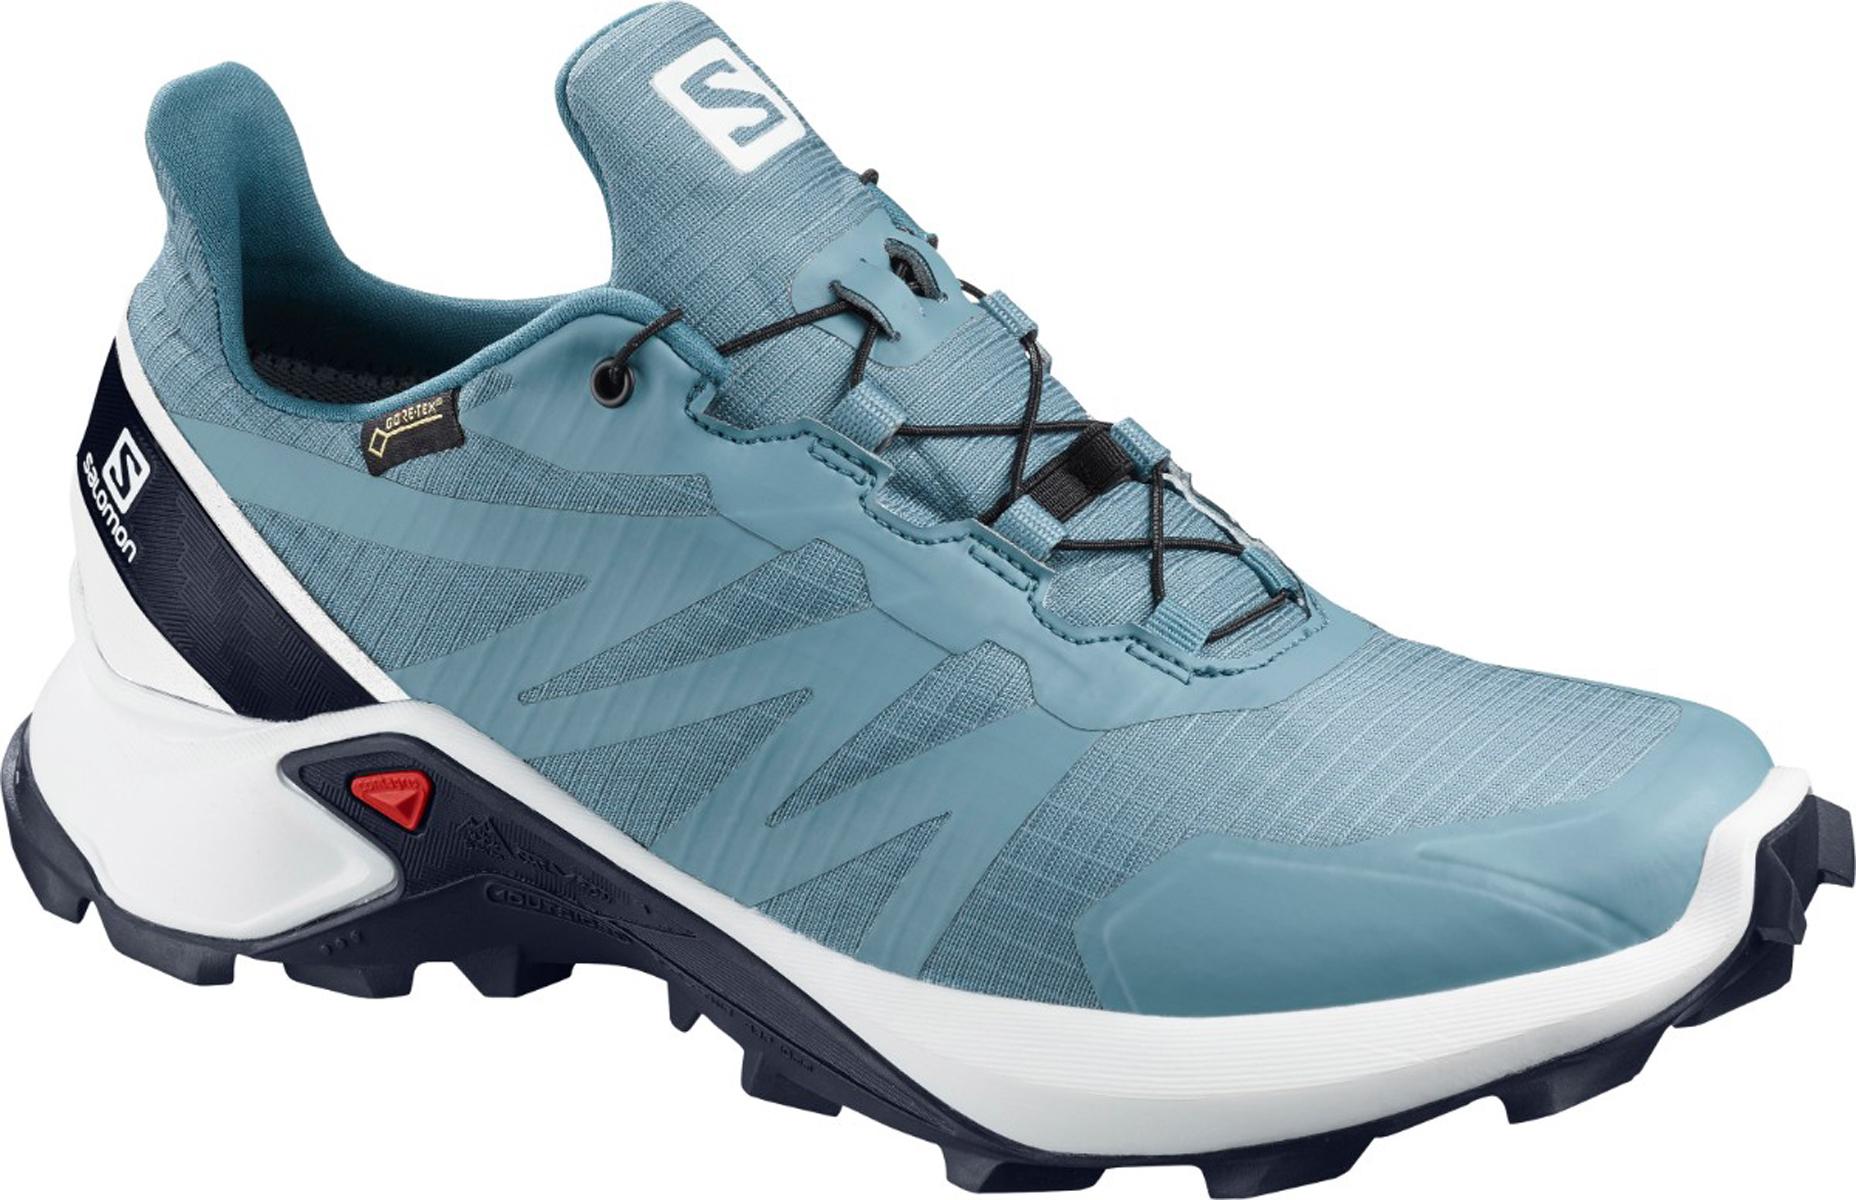 salomon women's gore tex trail running shoes jacket